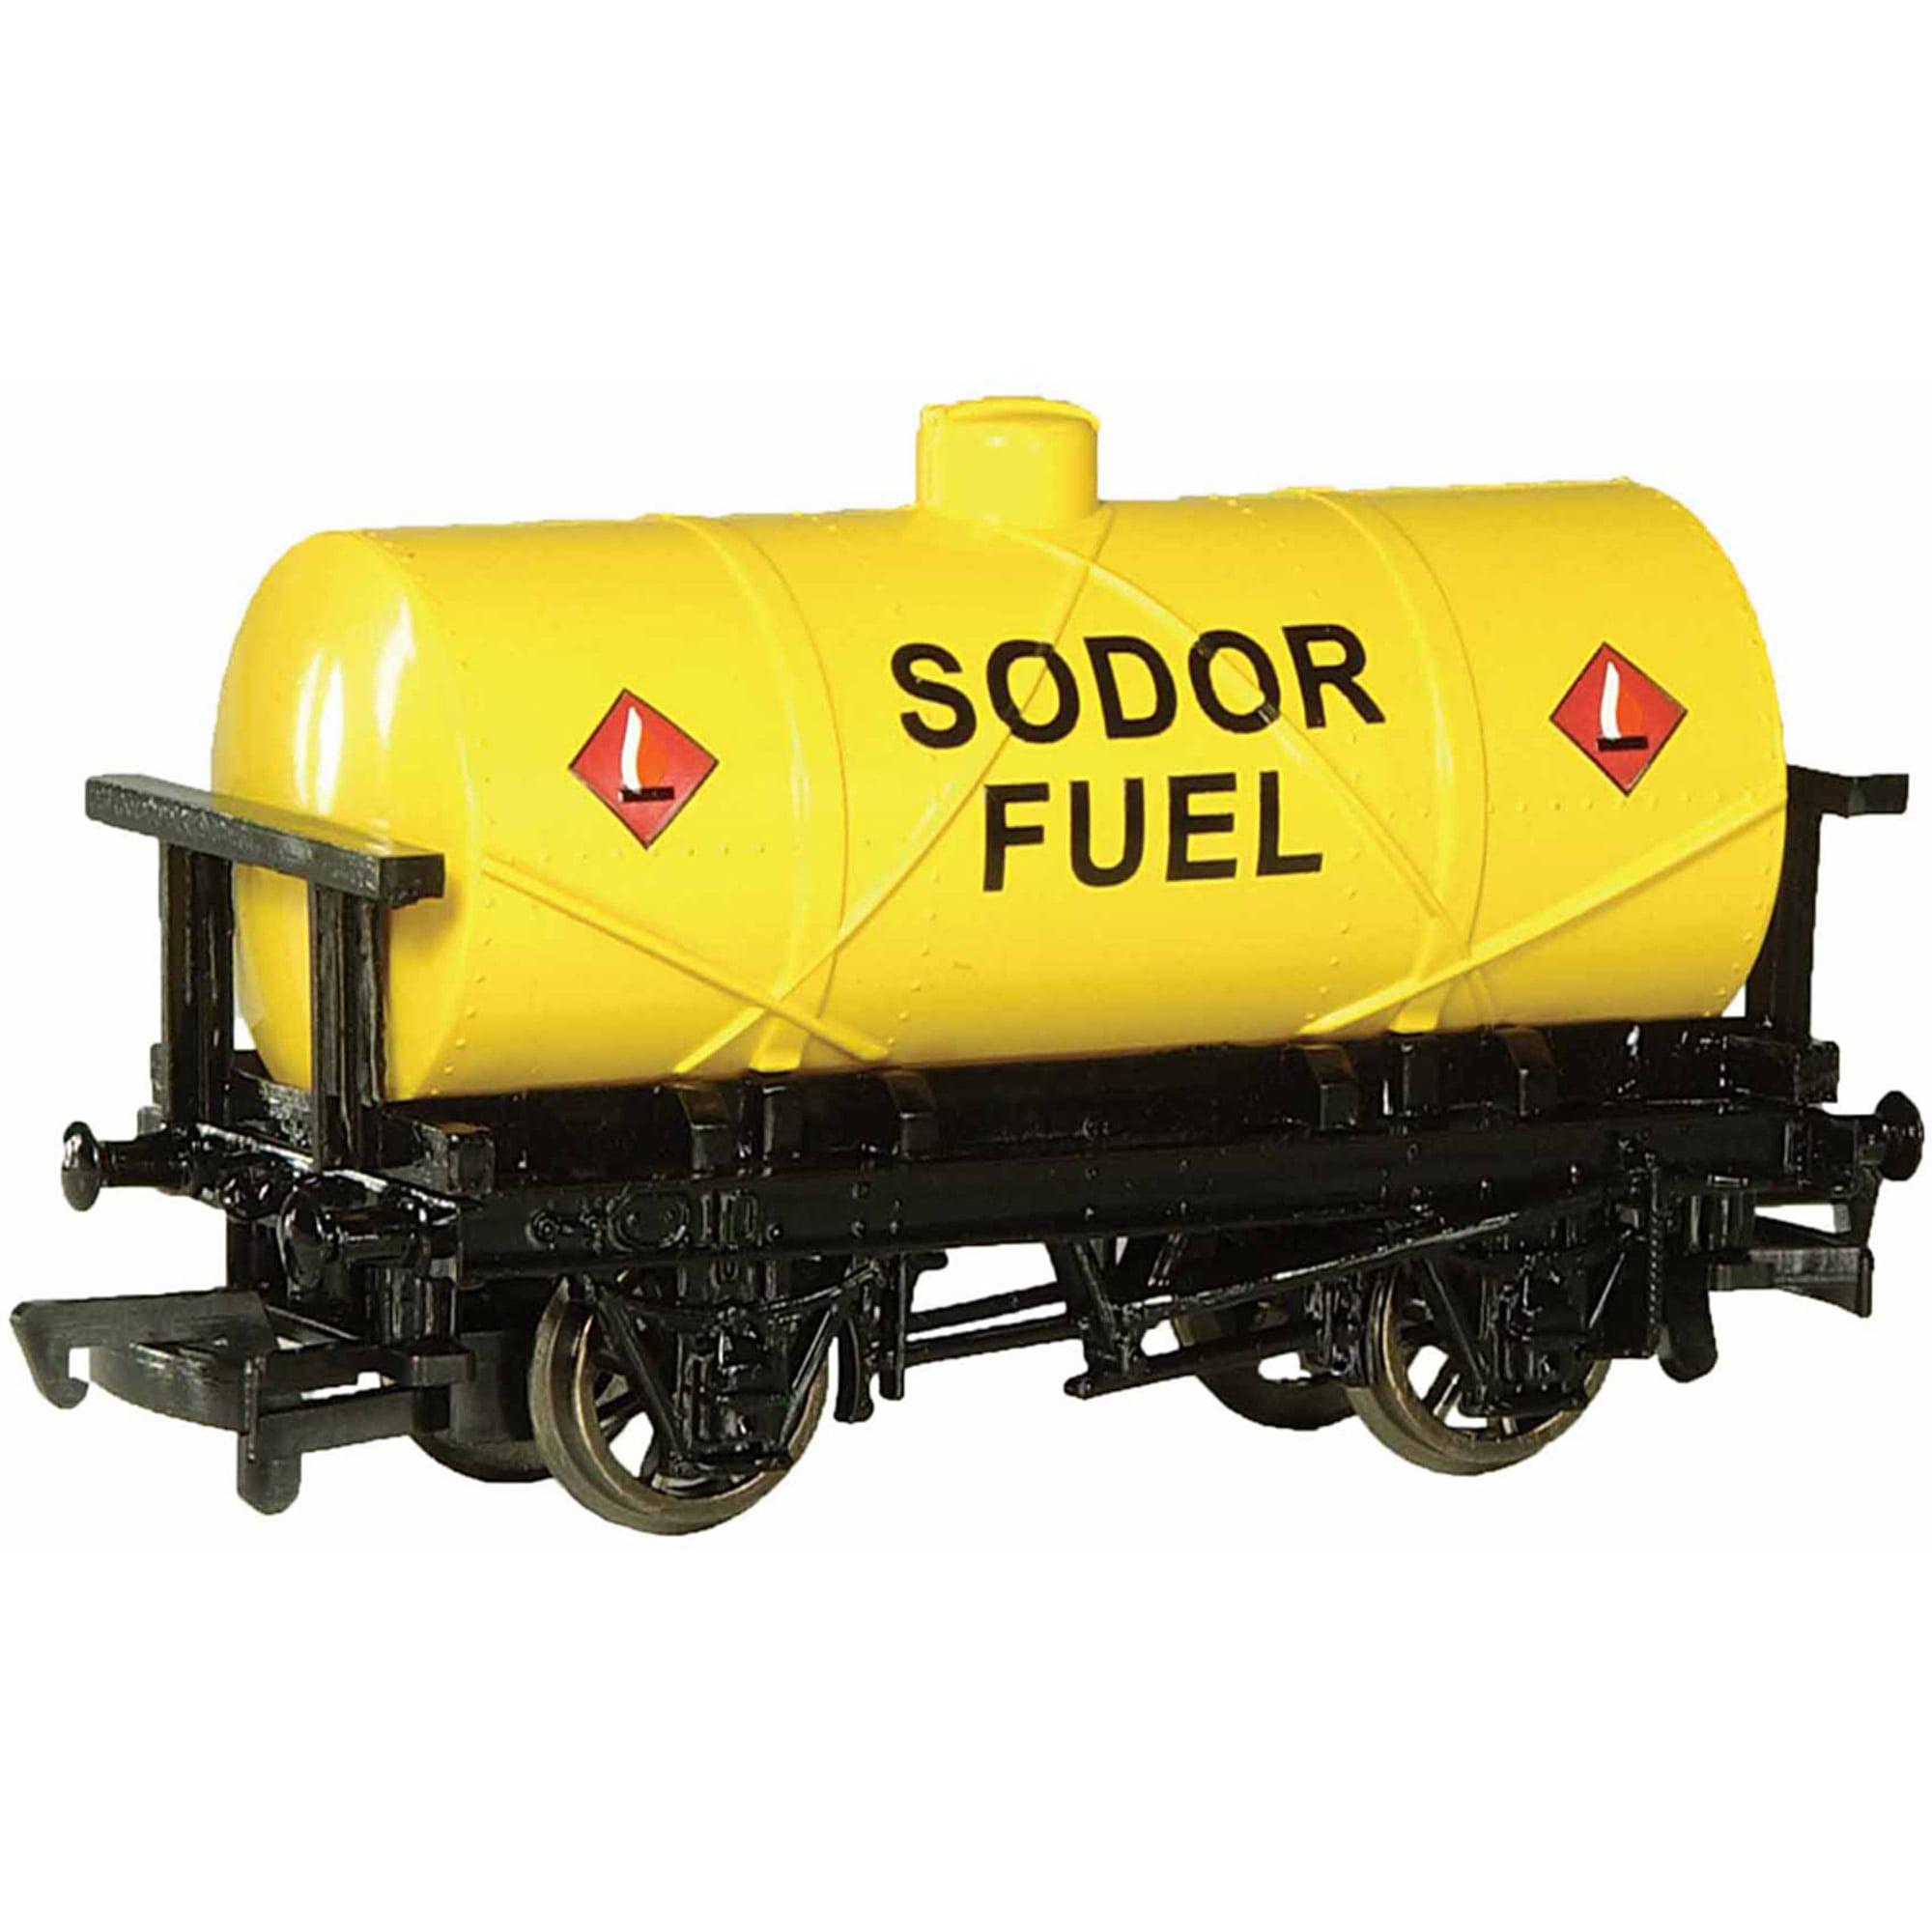 Bachmann Trains Thomas and Friends Sodor Fuel Tank, HO Scale Train by Bachmann